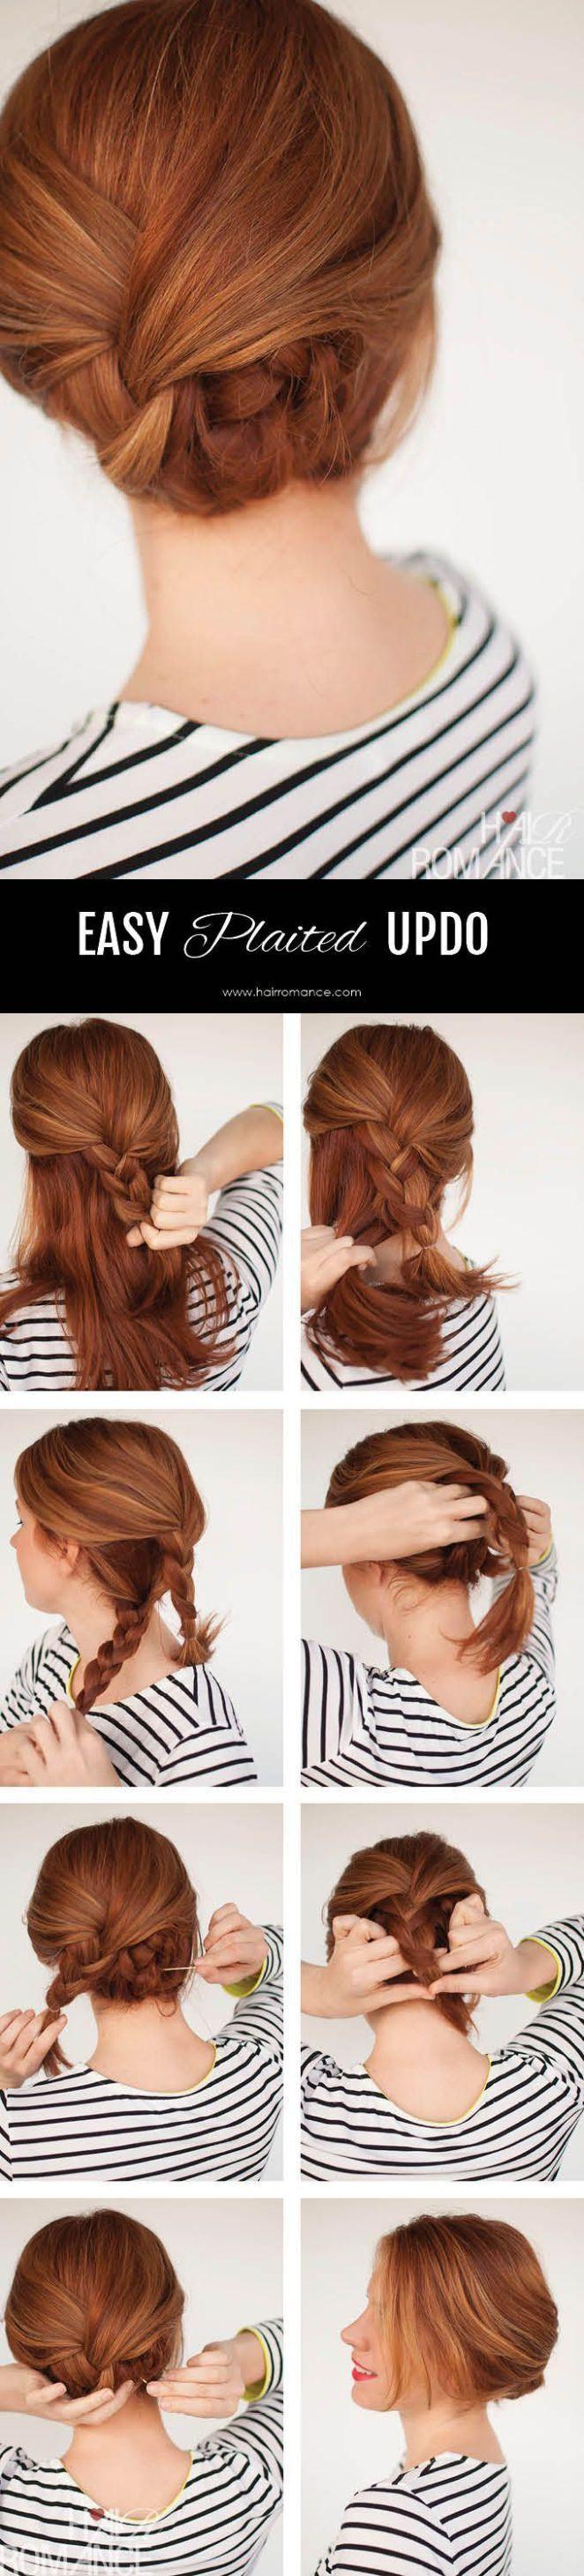 Best 25 Easy braided updo ideas on Pinterest